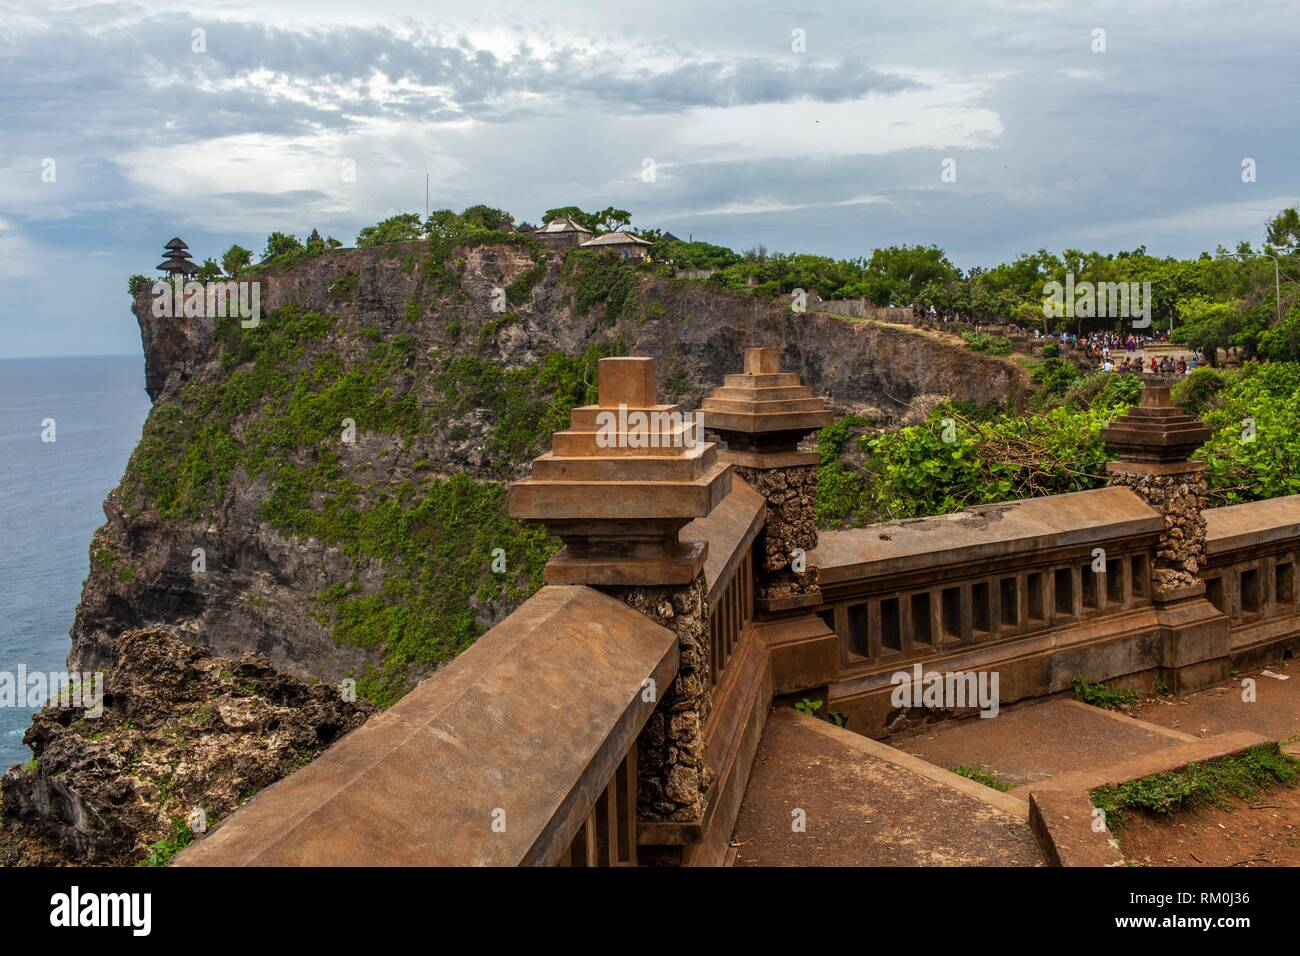 Uluwatu temple (Pura Luhur UluWatu) and cliffs. Uluwatu. Bali, Indonesia, Asia Stock Photo